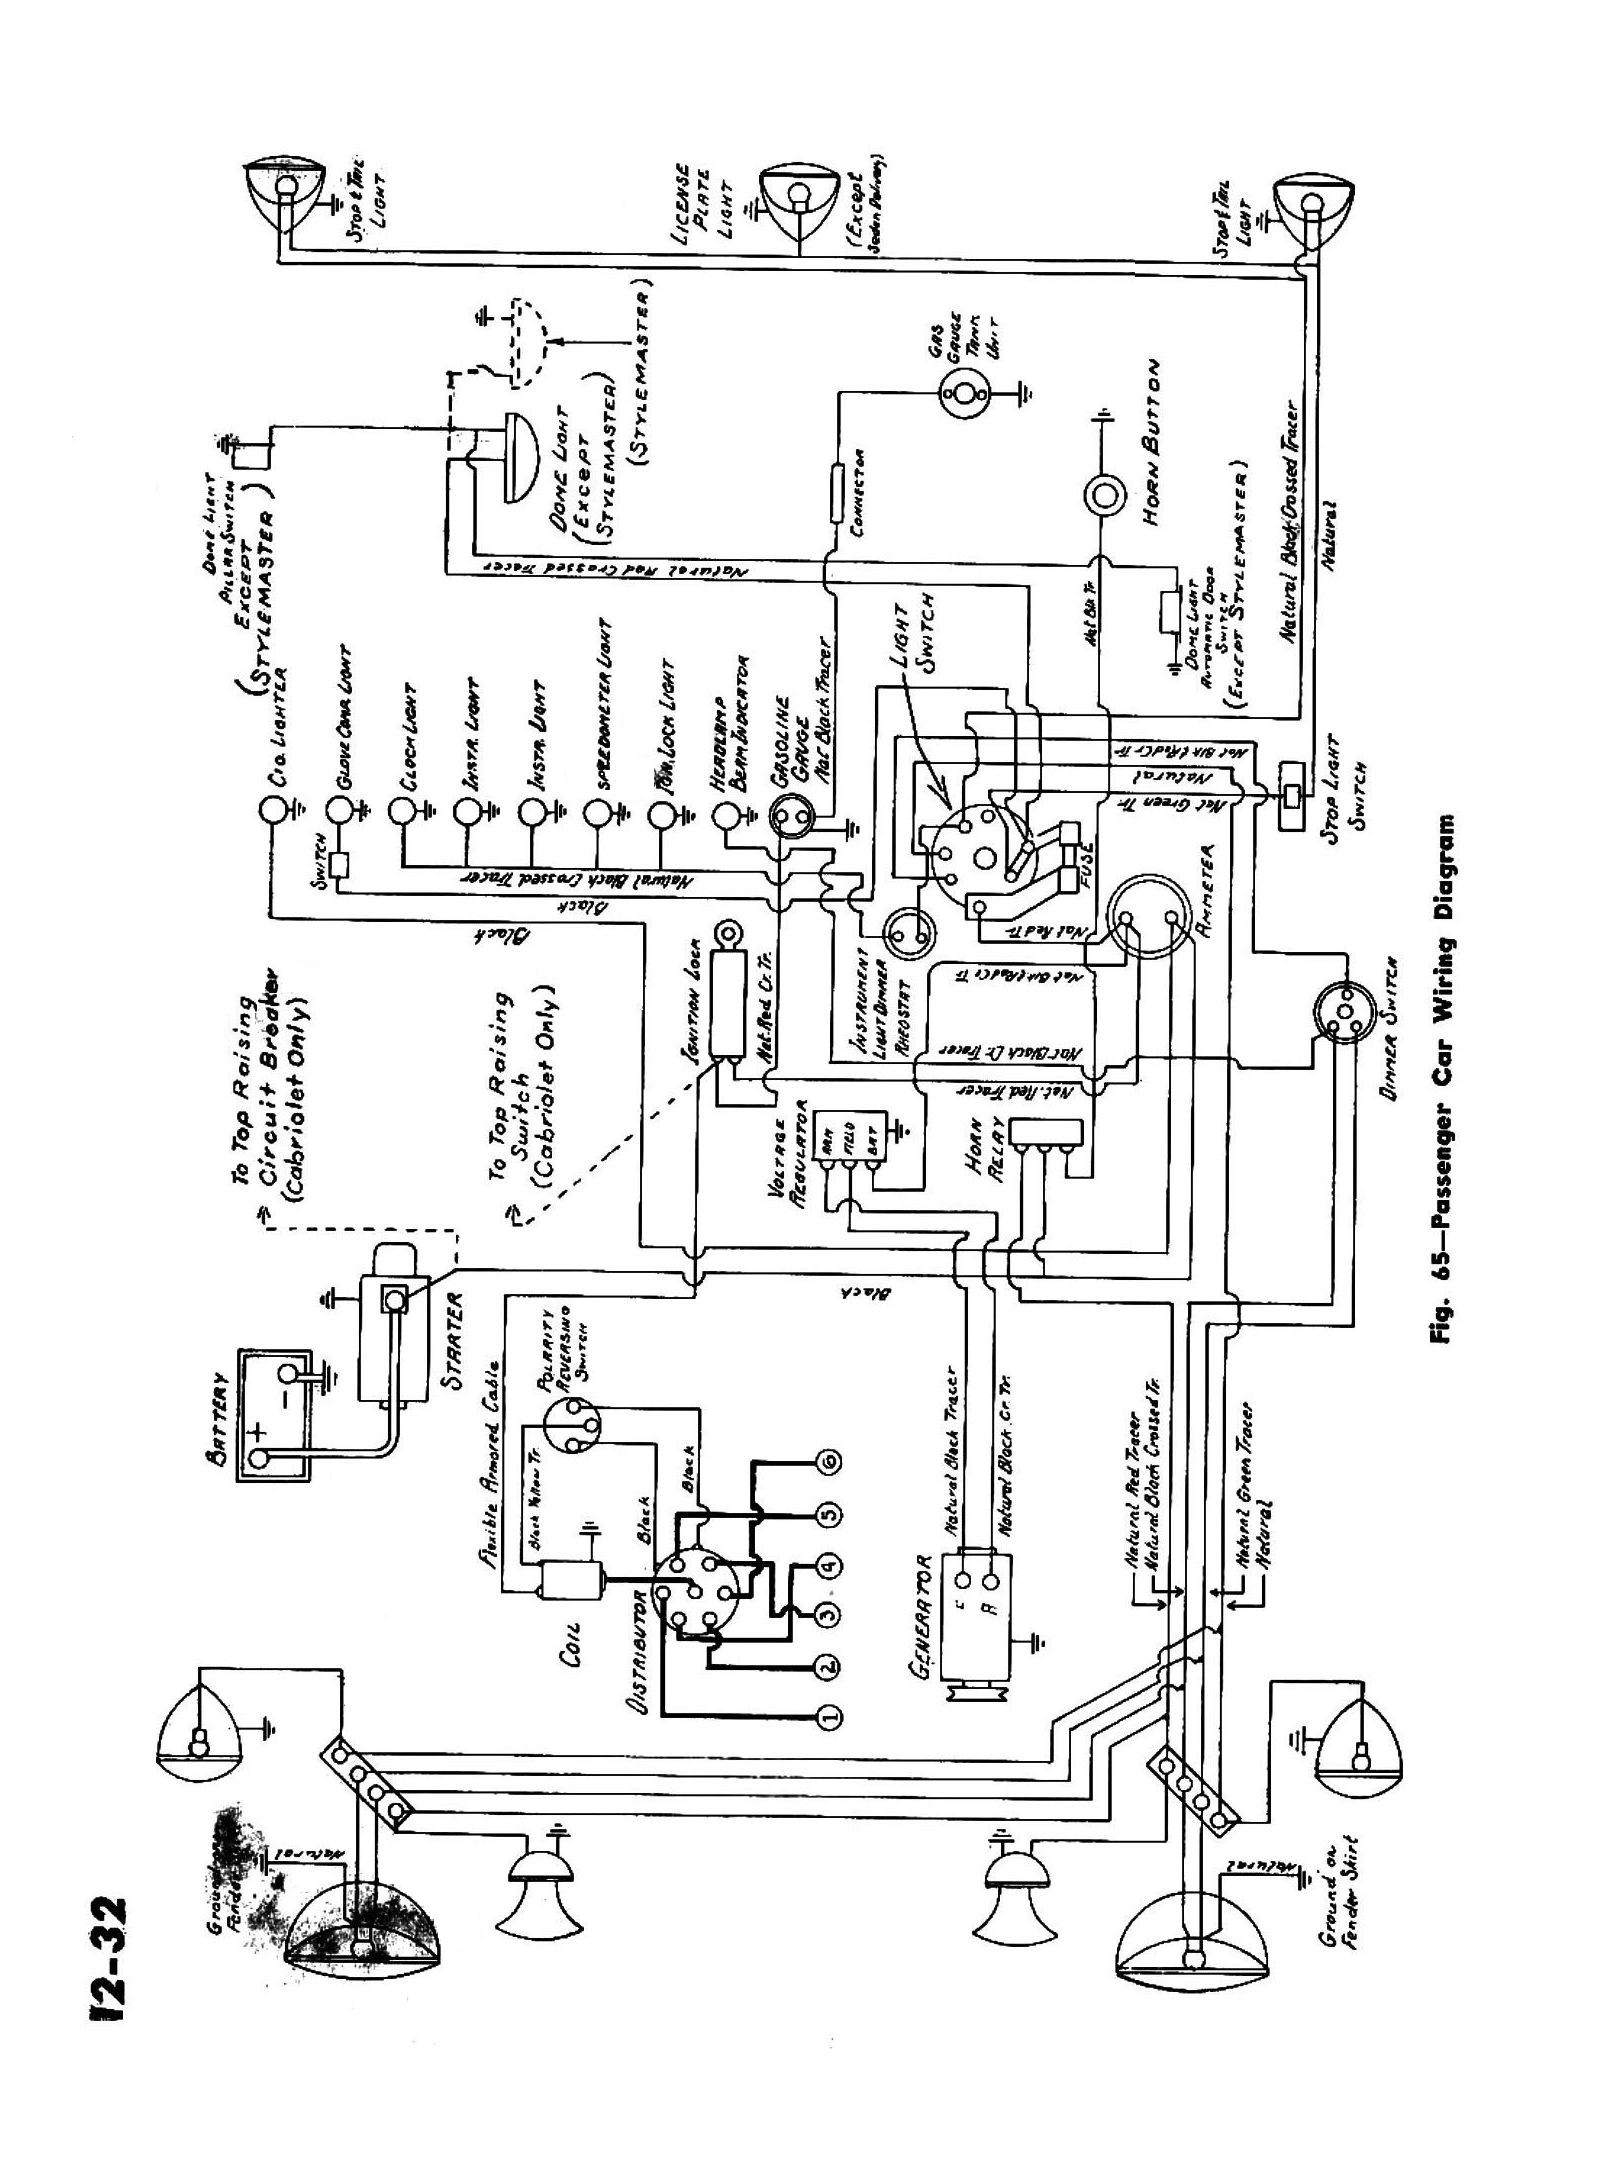 Generator Wiring Diagram and Electrical Schematics Pdf